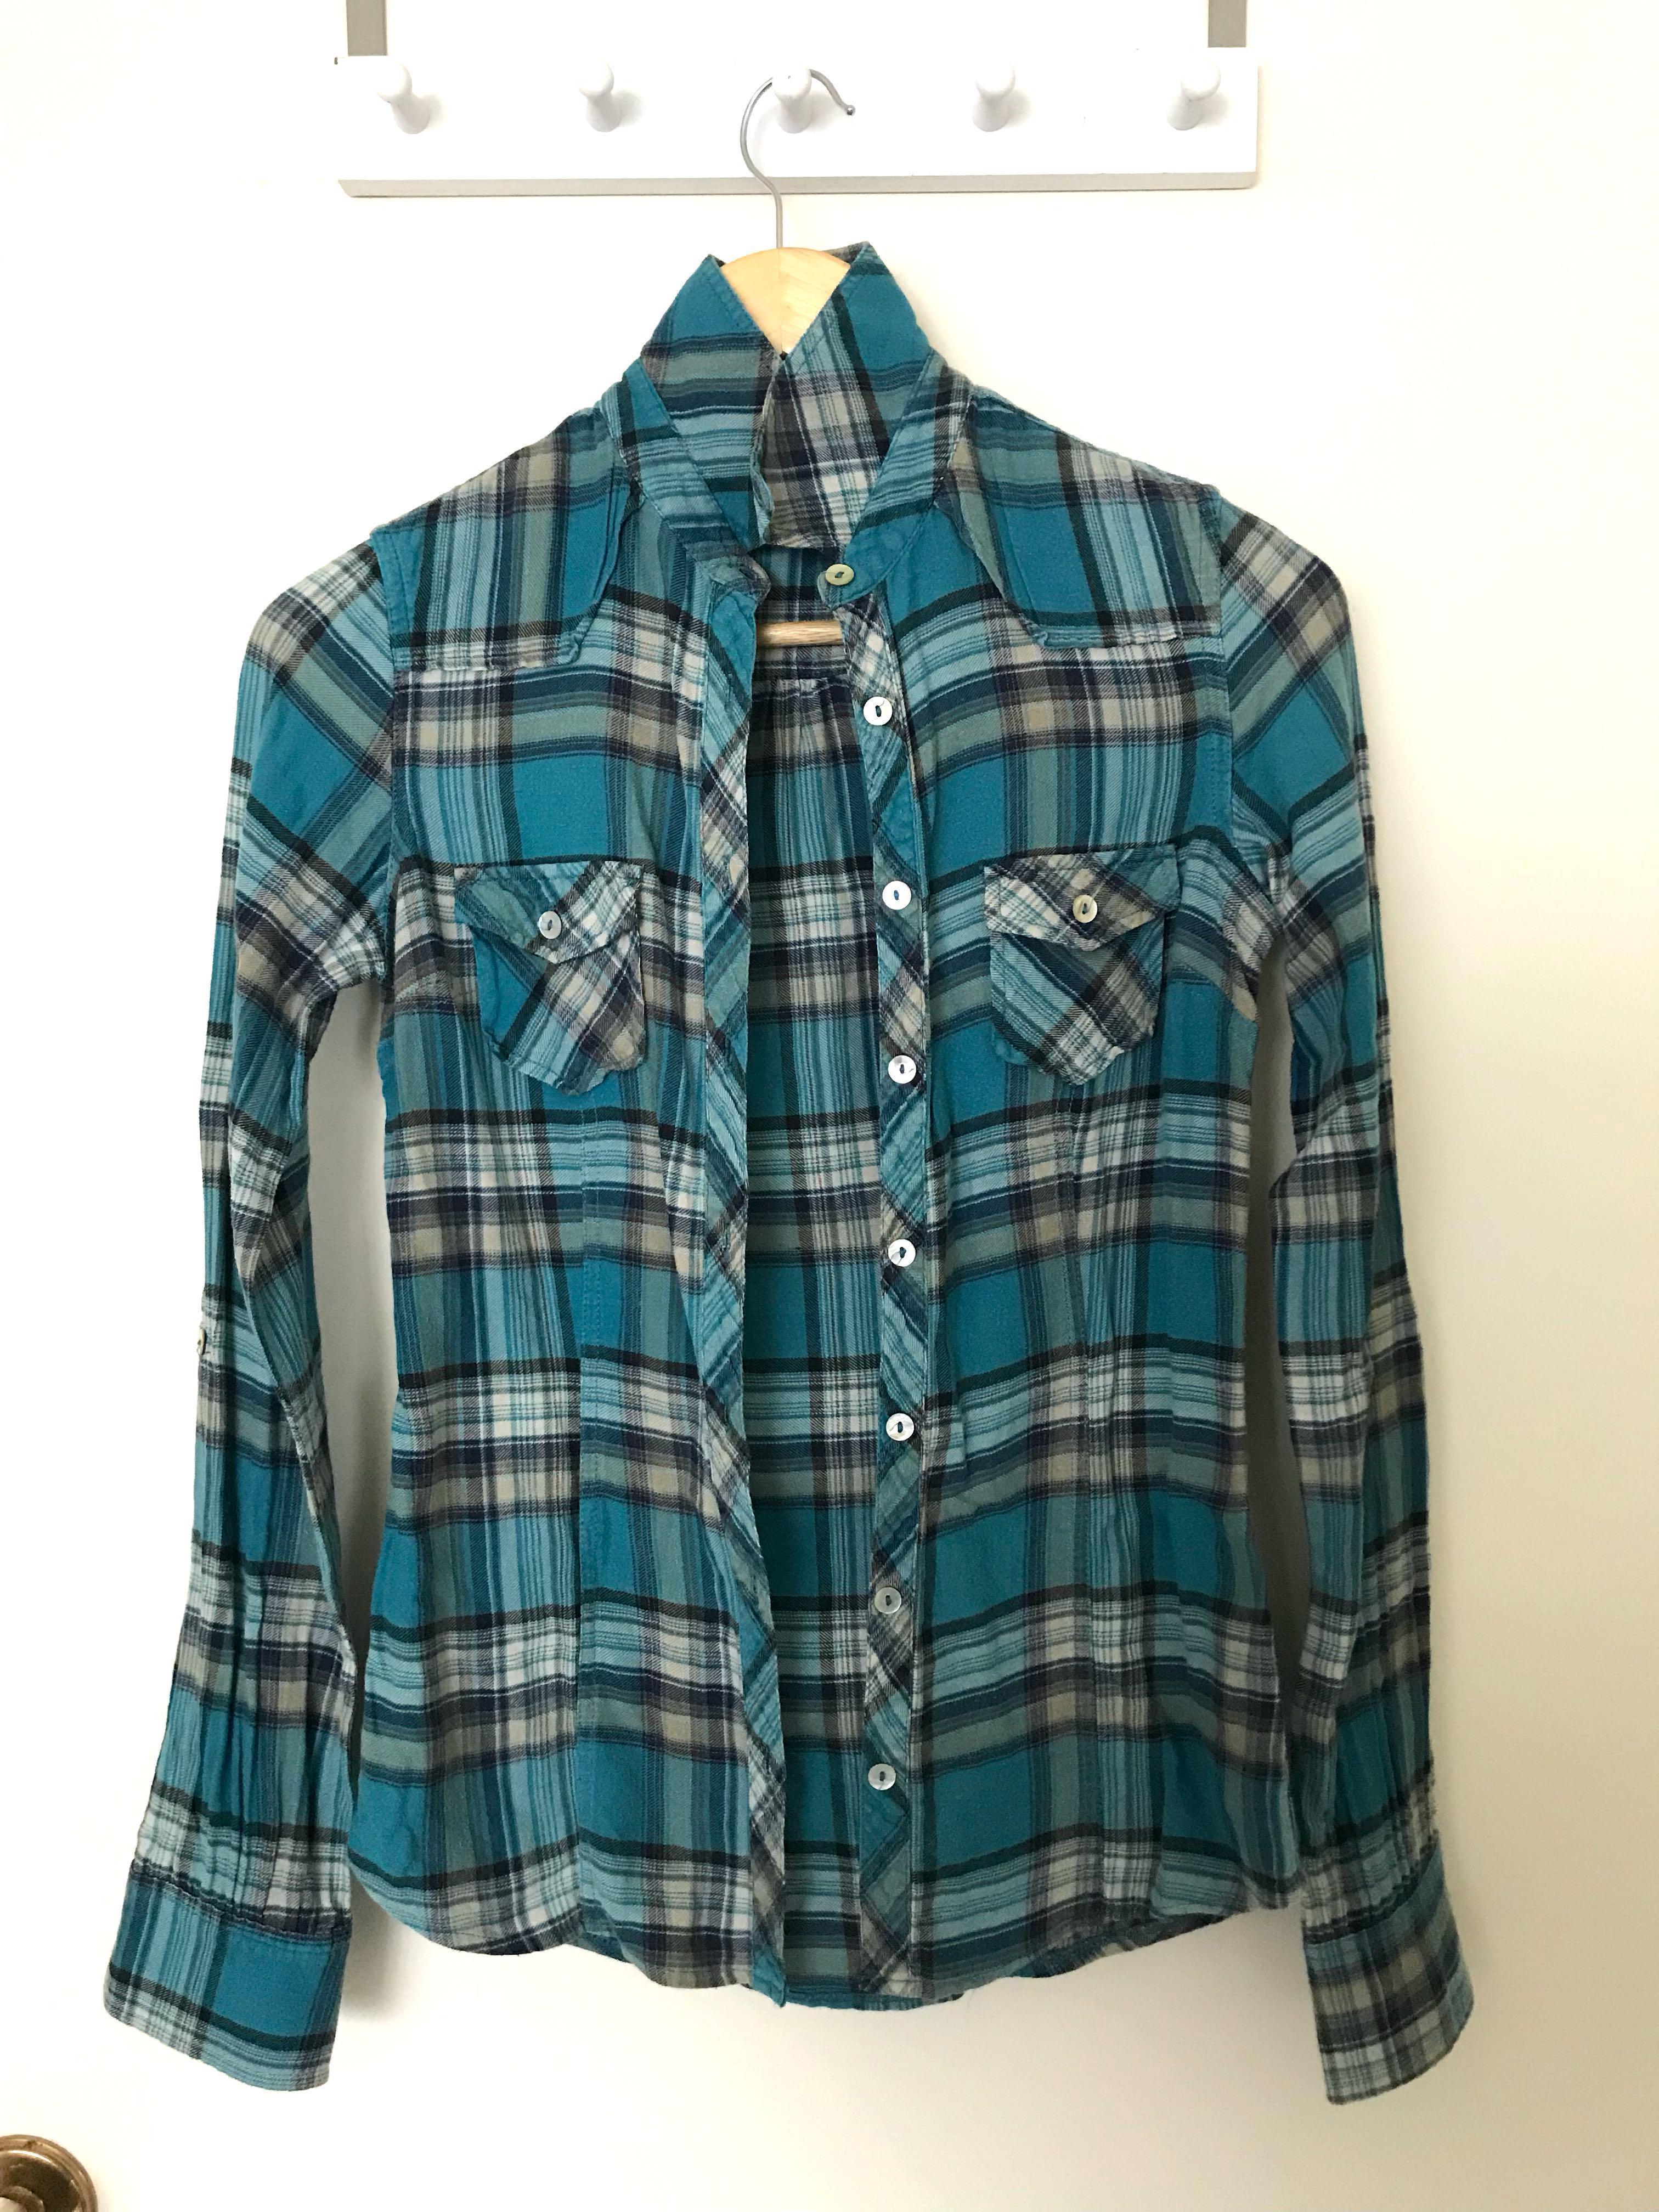 Green Checkered Long Sleeved Shirt